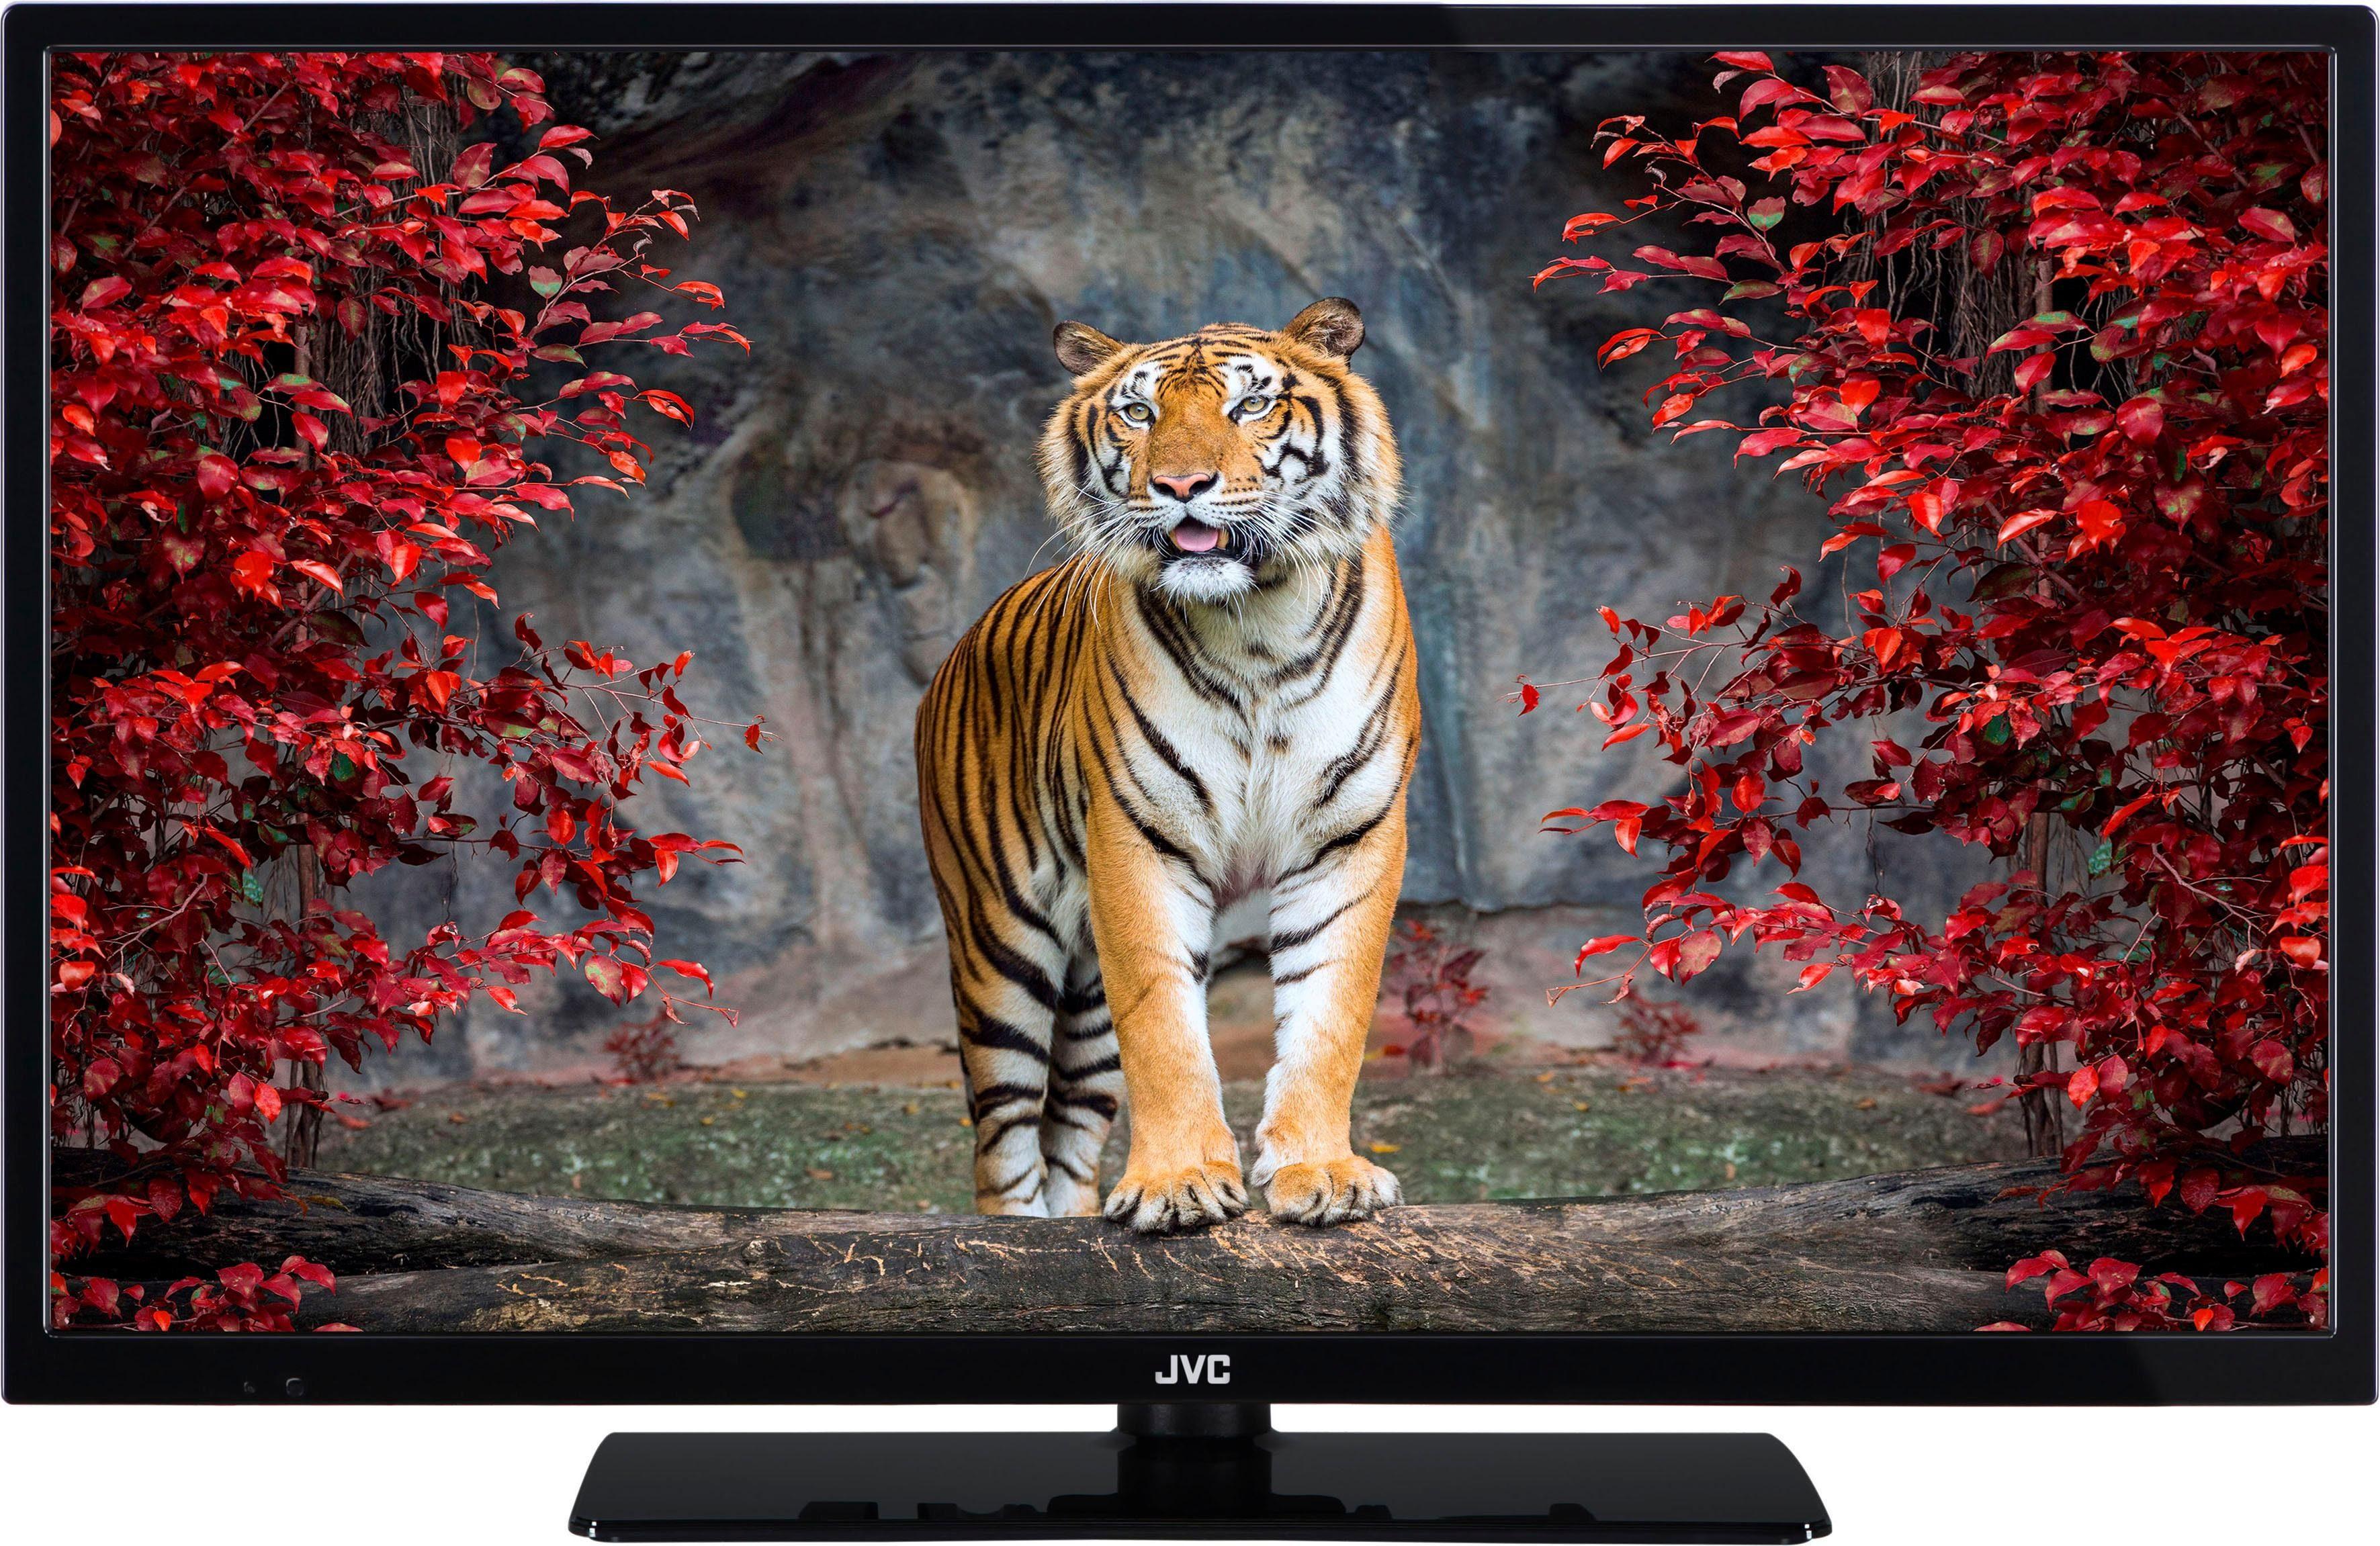 JVC LT-32V1000 LED-Fernseher (81 cm/32 Zoll, HD-ready)